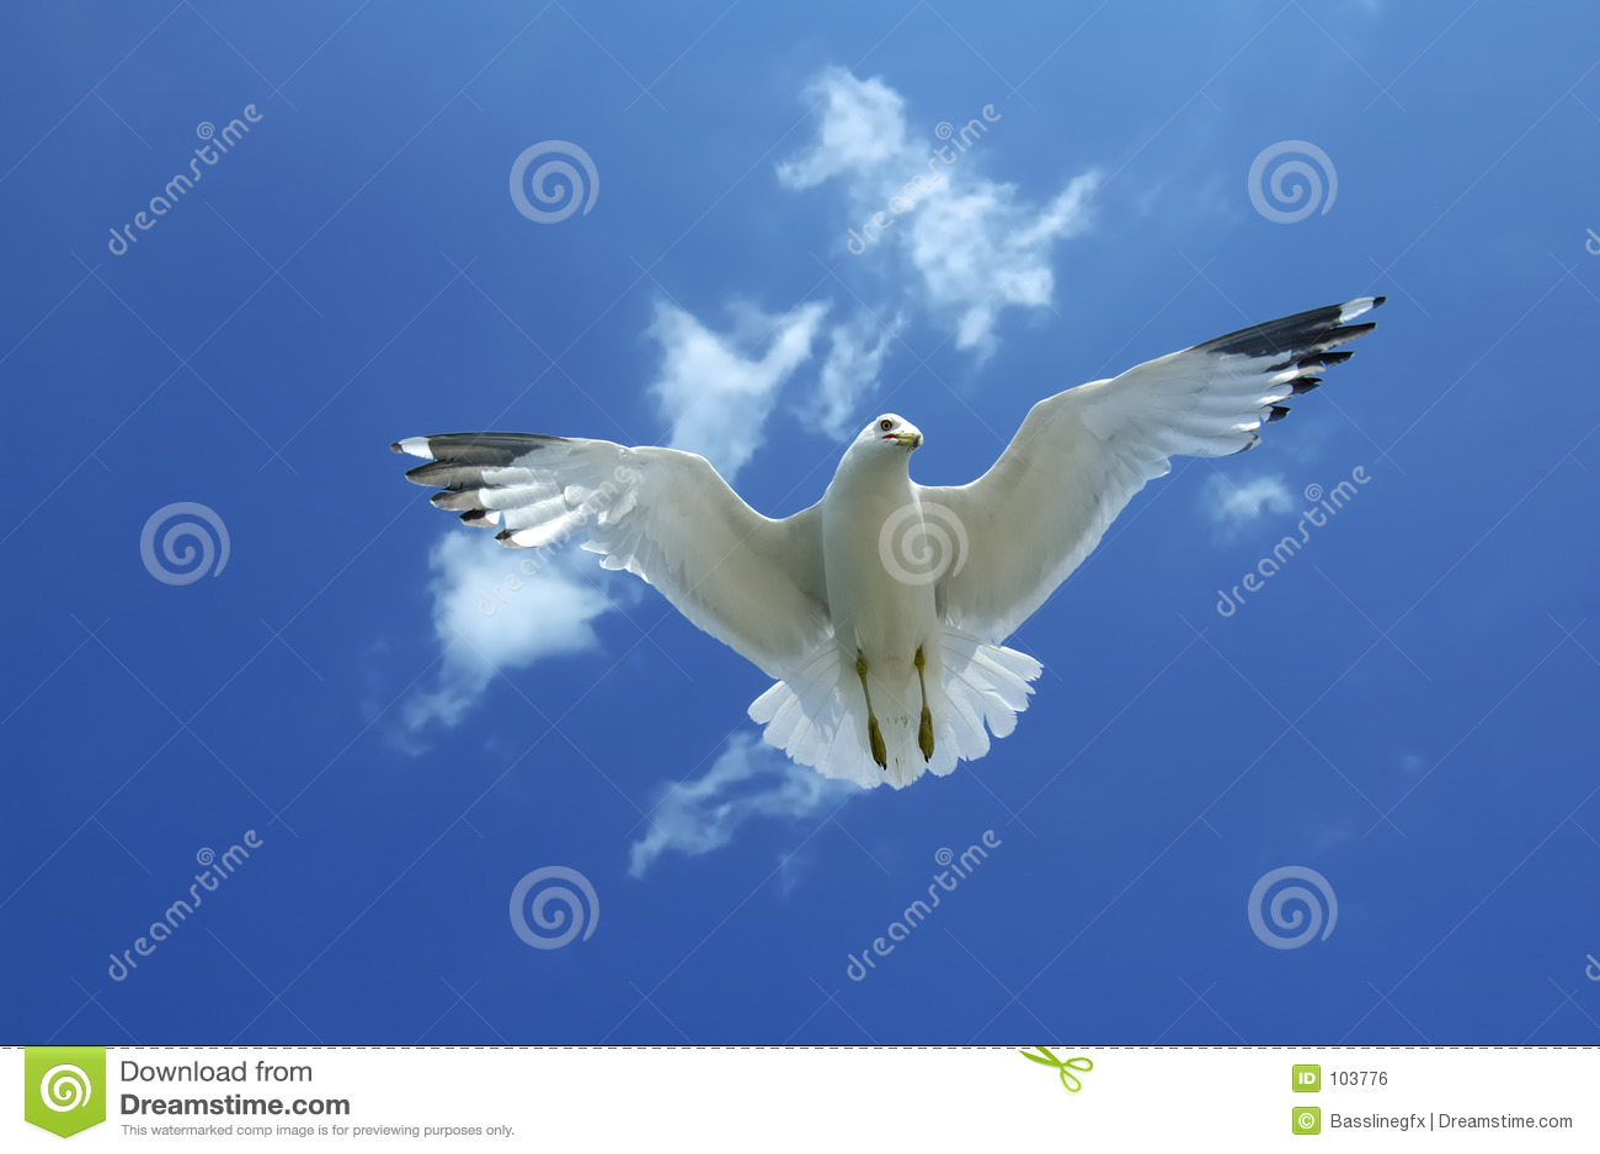 Gull Underneath - Lighther Blue